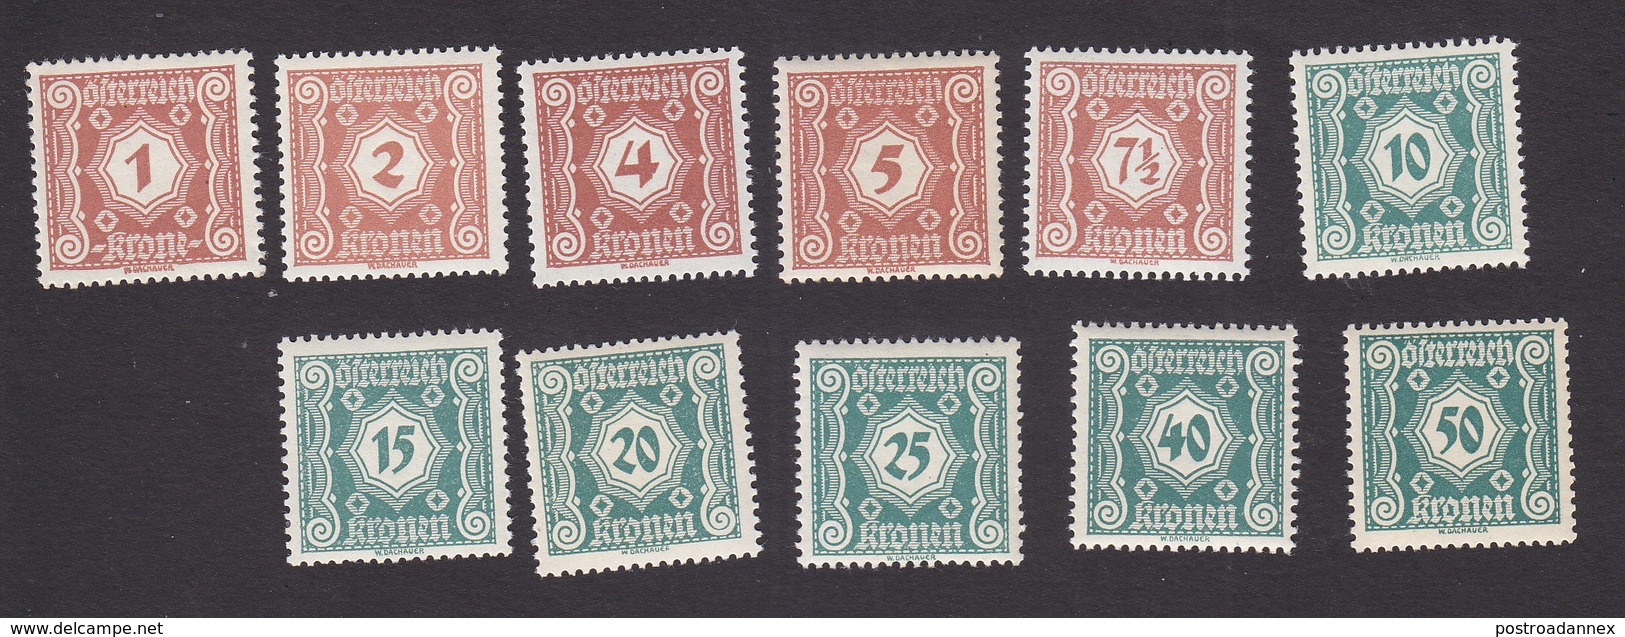 Austria, Scott #J103-J113, Mint Never Hinged, Postage Due, Issued 1922 - Postage Due